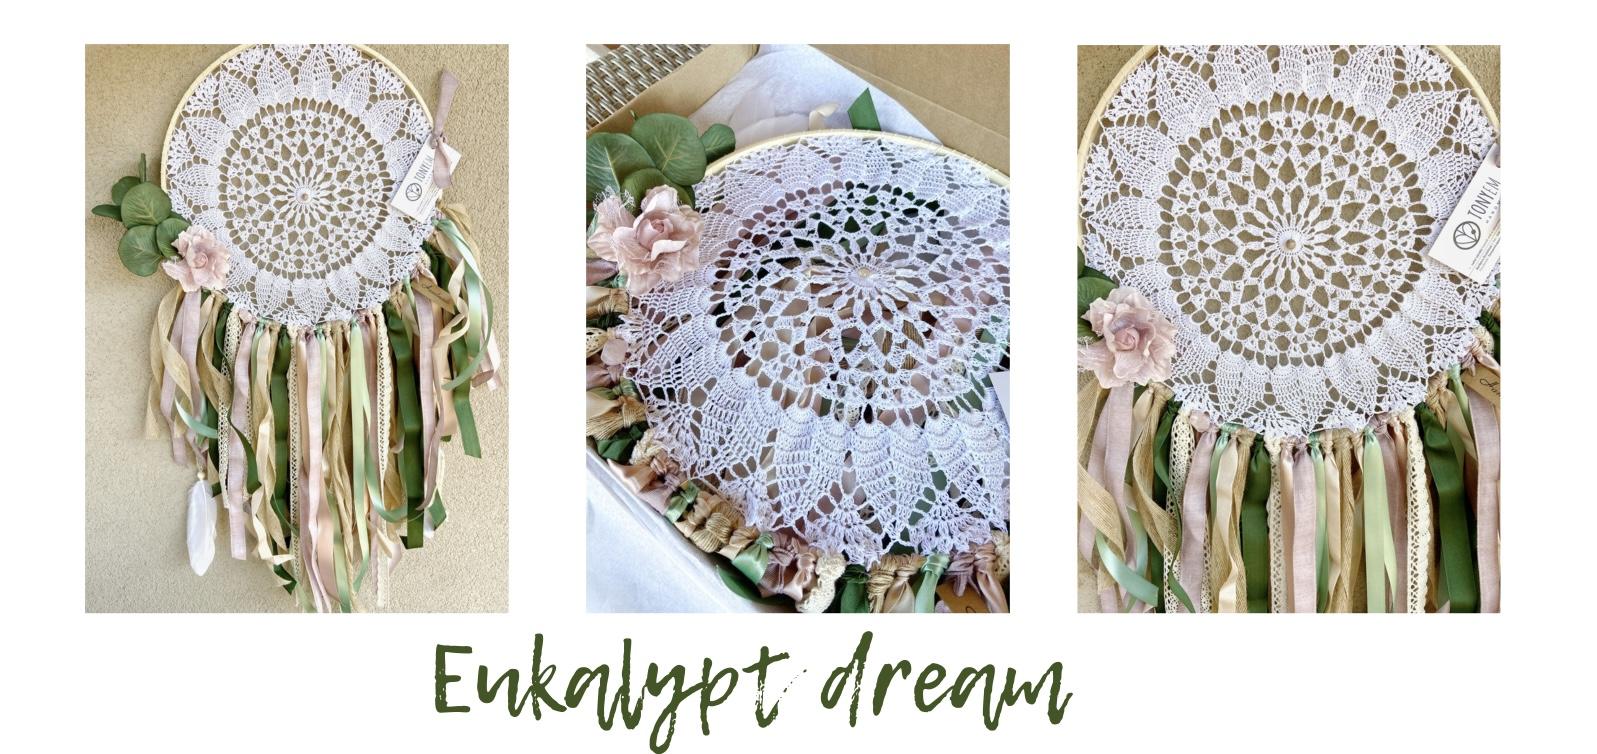 eukalypt dream